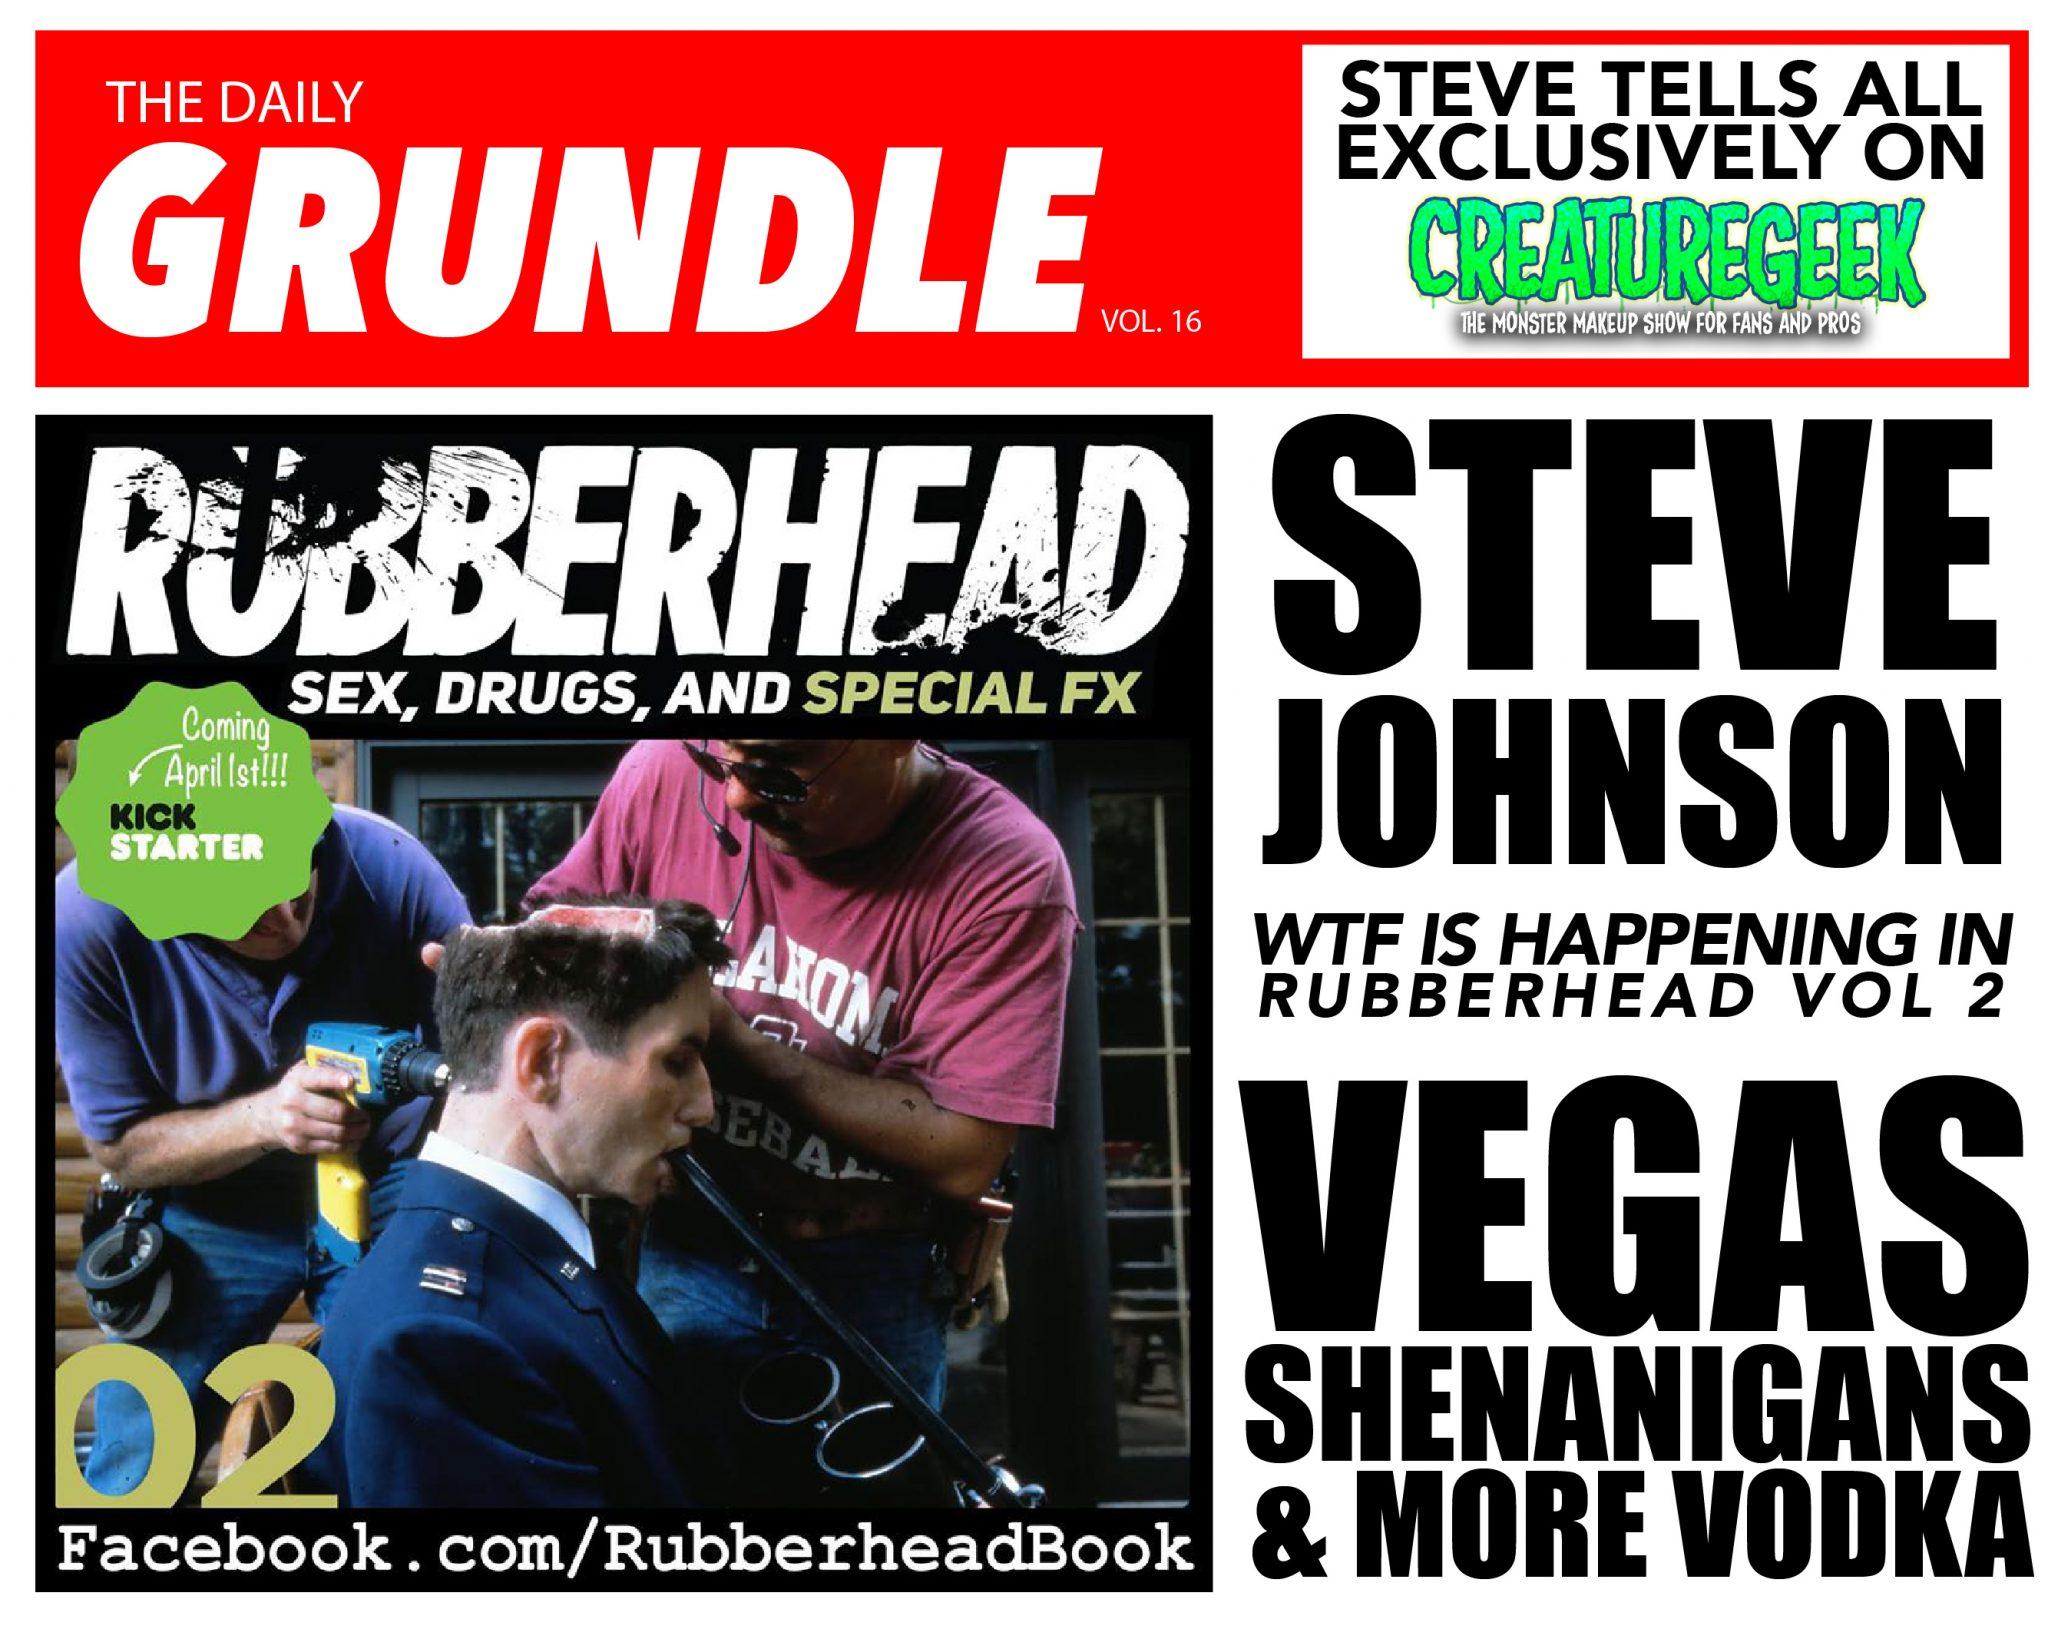 Ask Steve Johnson Anything! - Creature Geek : Episode 86